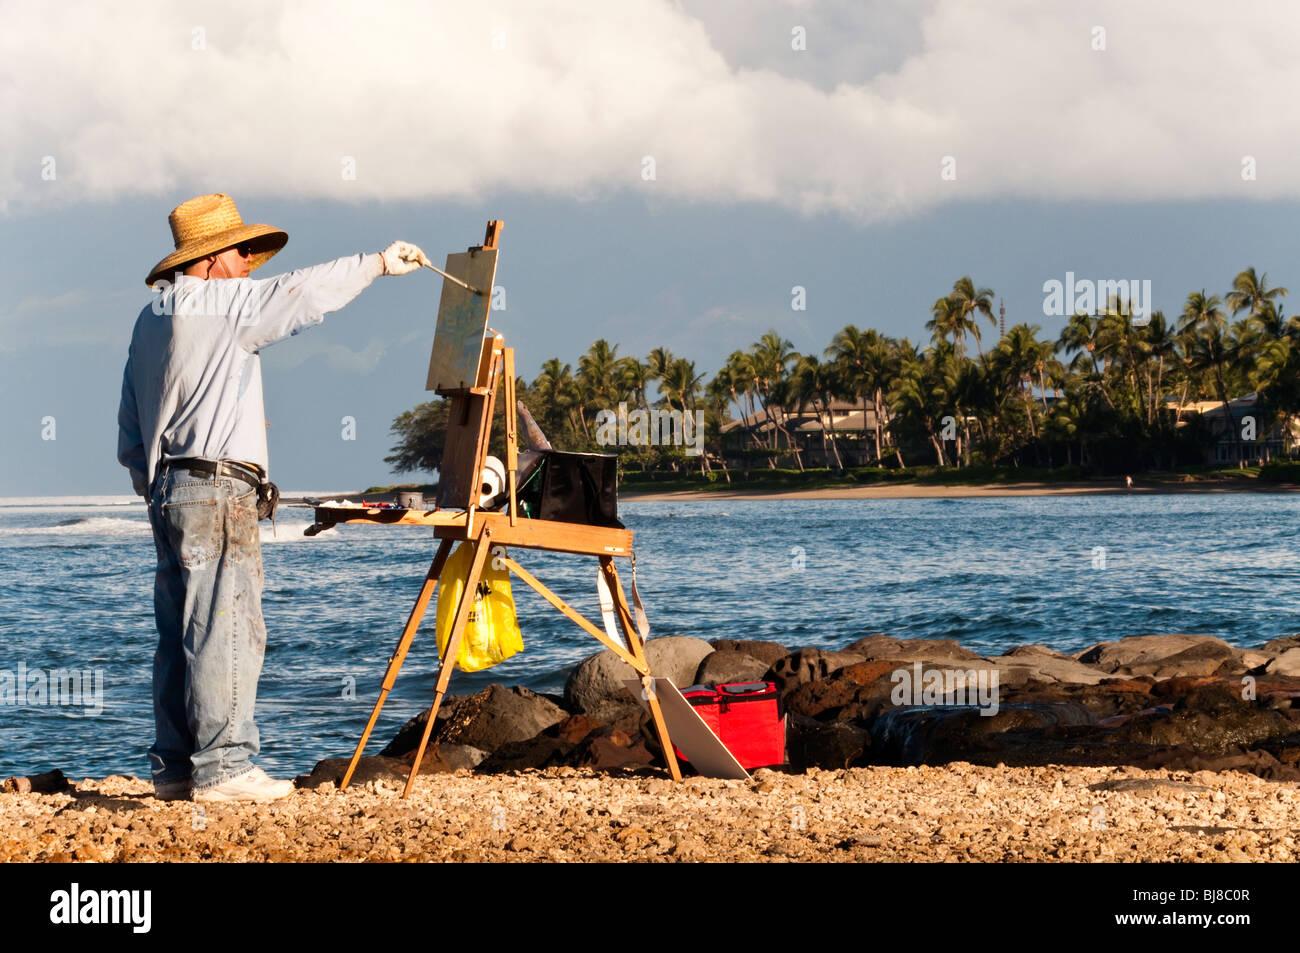 'Plein Air' artist painting at Lahaina Harbor Maui Hawaii.  Molokai in the background - Stock Image